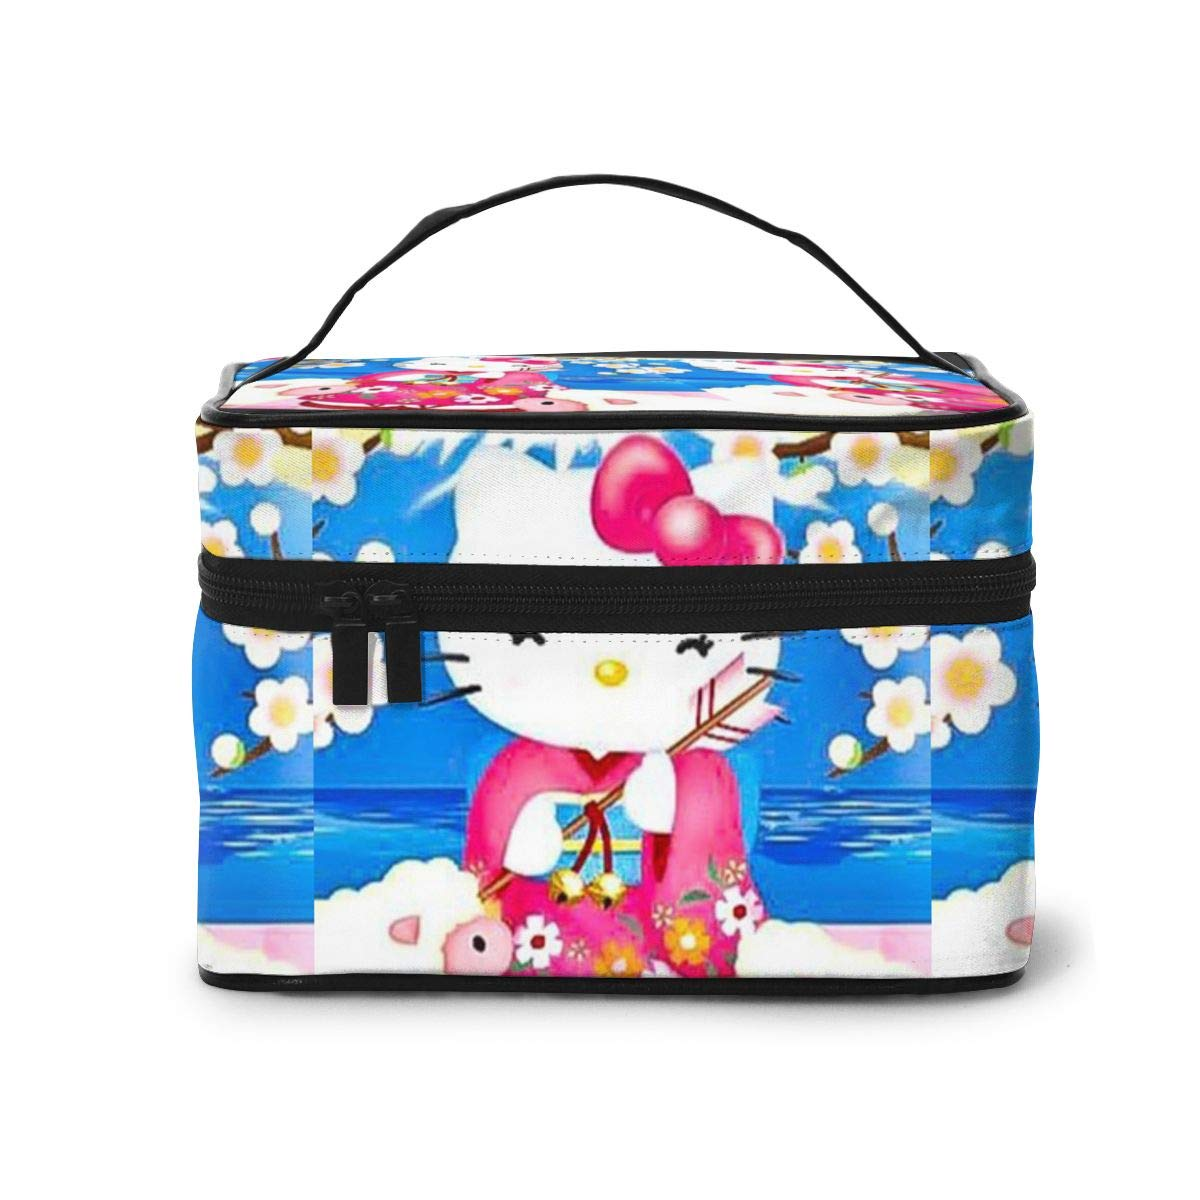 Makeup Bag, Kimono Hello Kitty Travel Portable Cosmetic Bag Large Pouch Mesh Brush Organizer Toiletry Bag for Women Girls